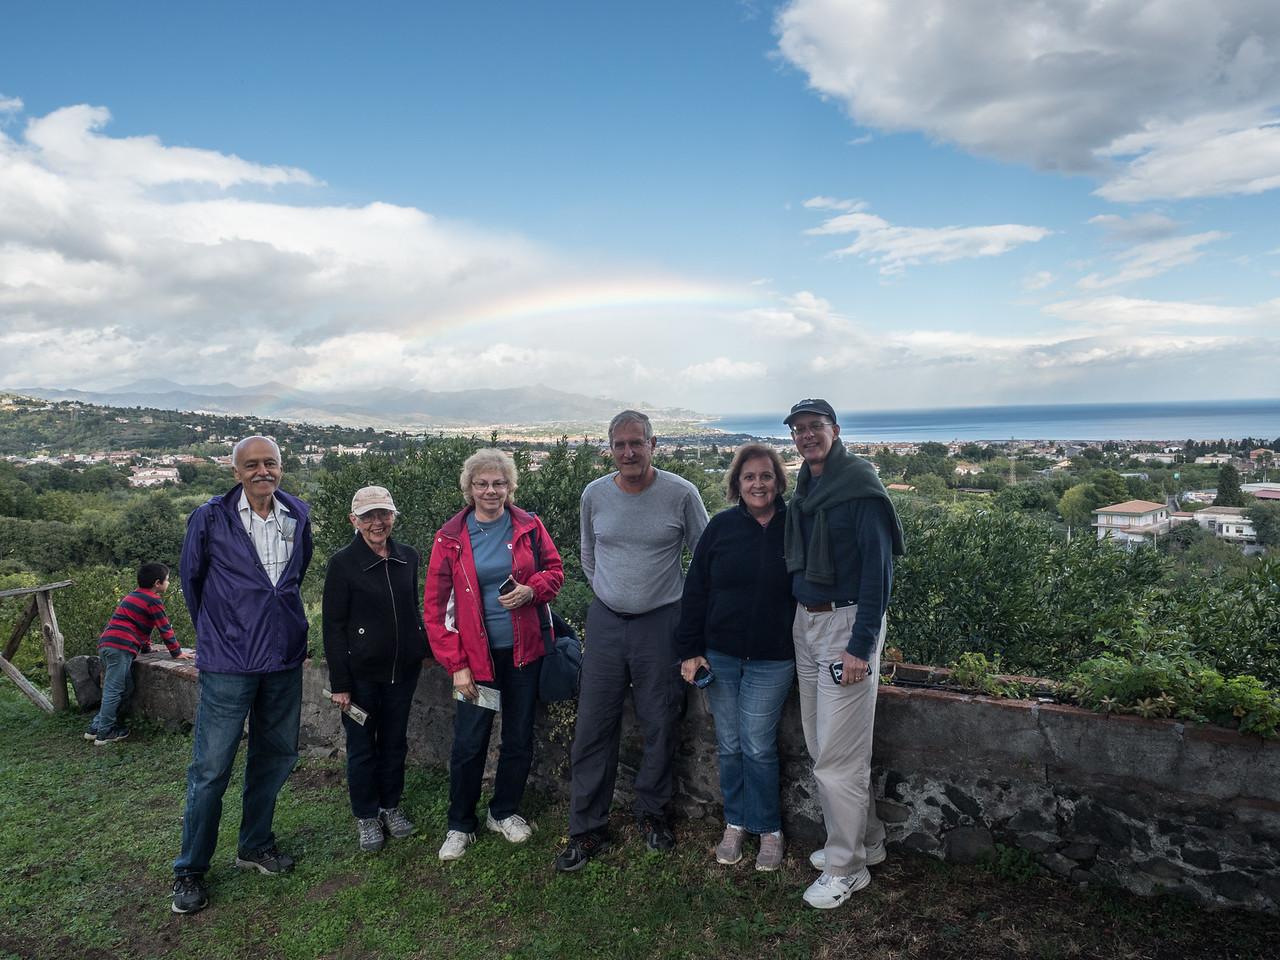 Alberto, Eleanor, Susan, Saul, Mary Alice and Rich